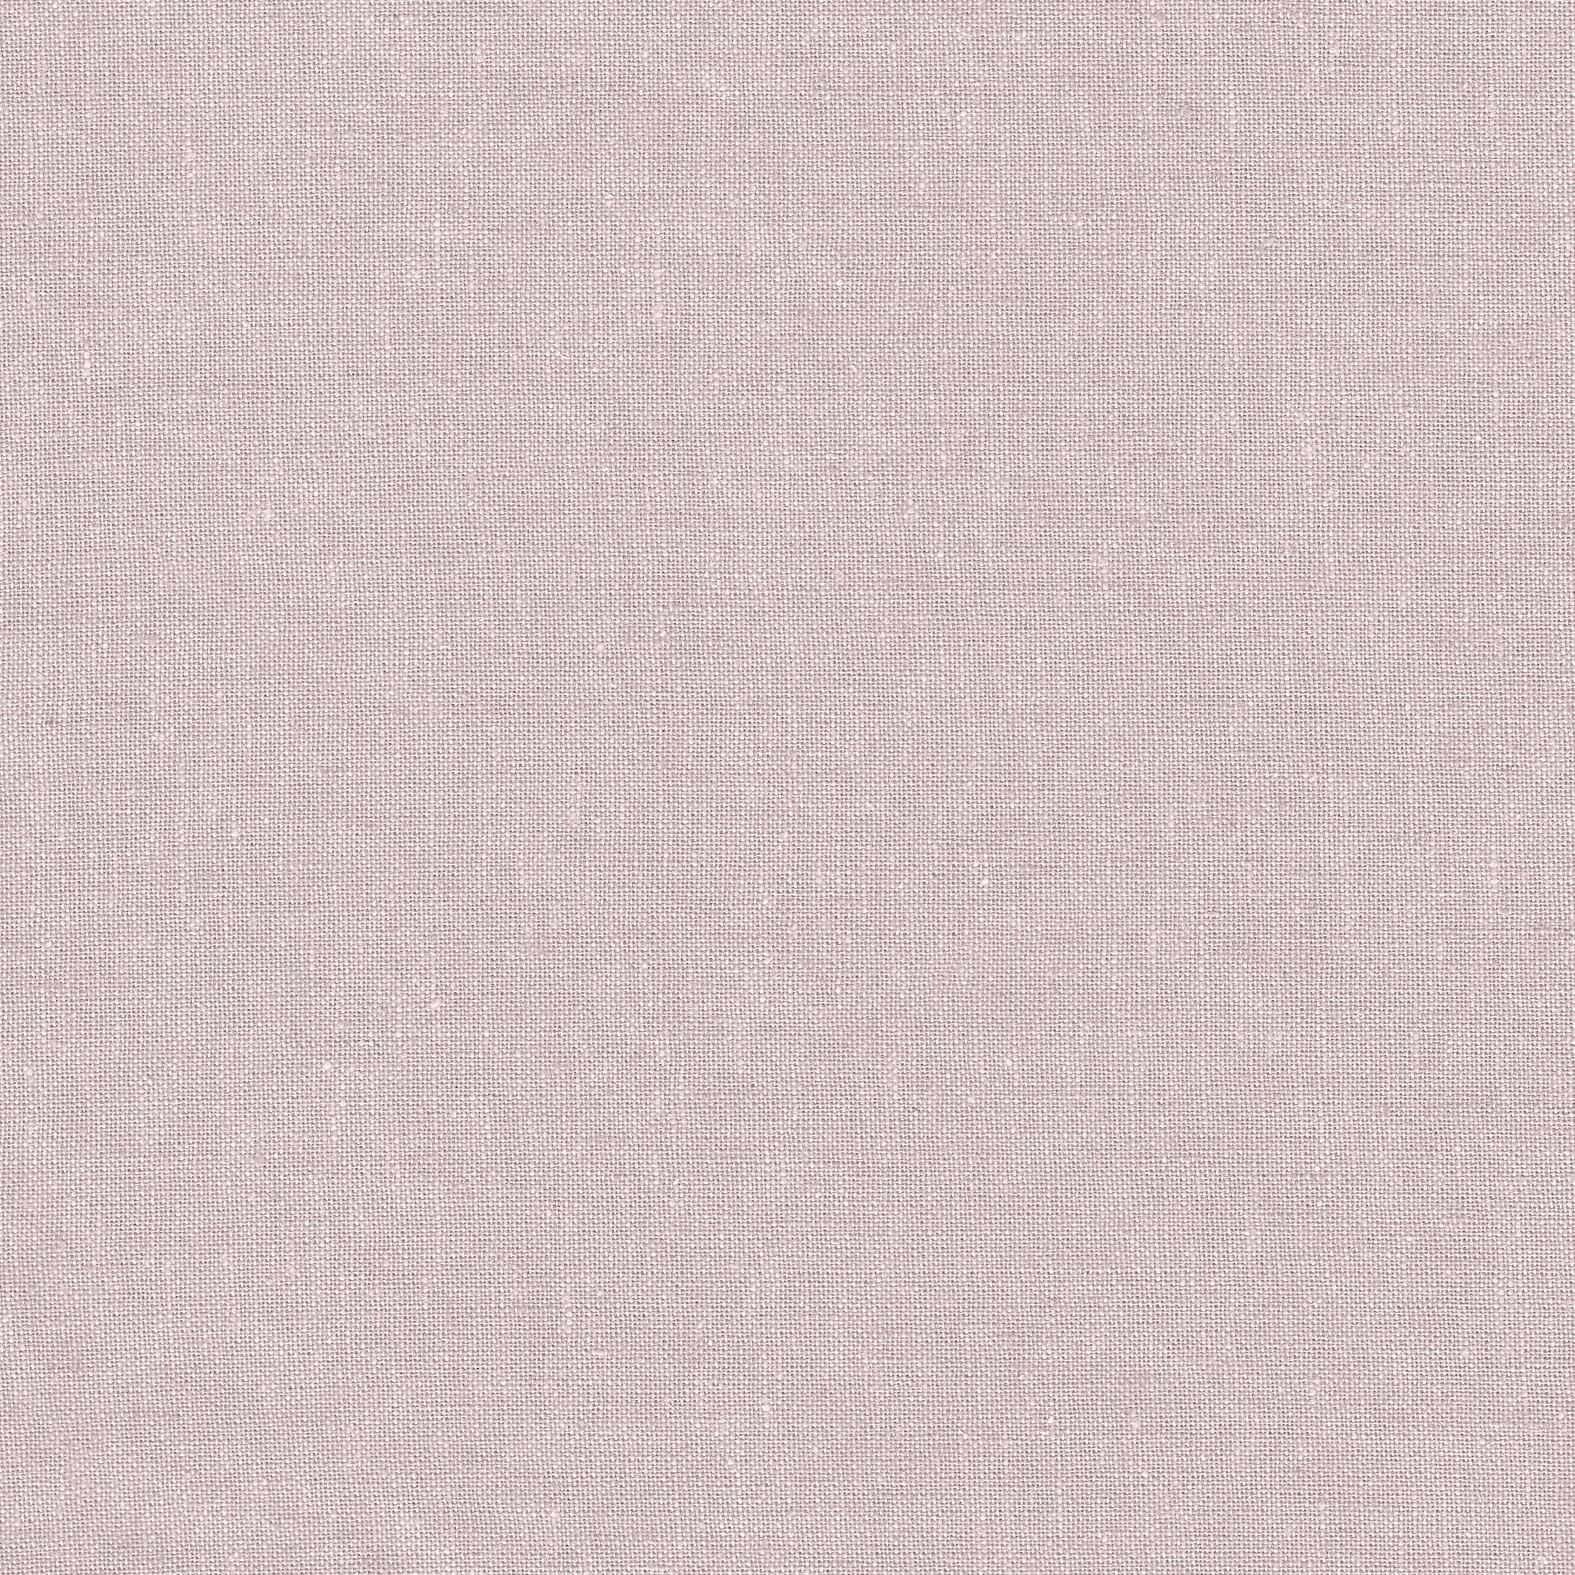 Robert Kaufman : Essex Yarn Dyed : Heather : 1/2 metre